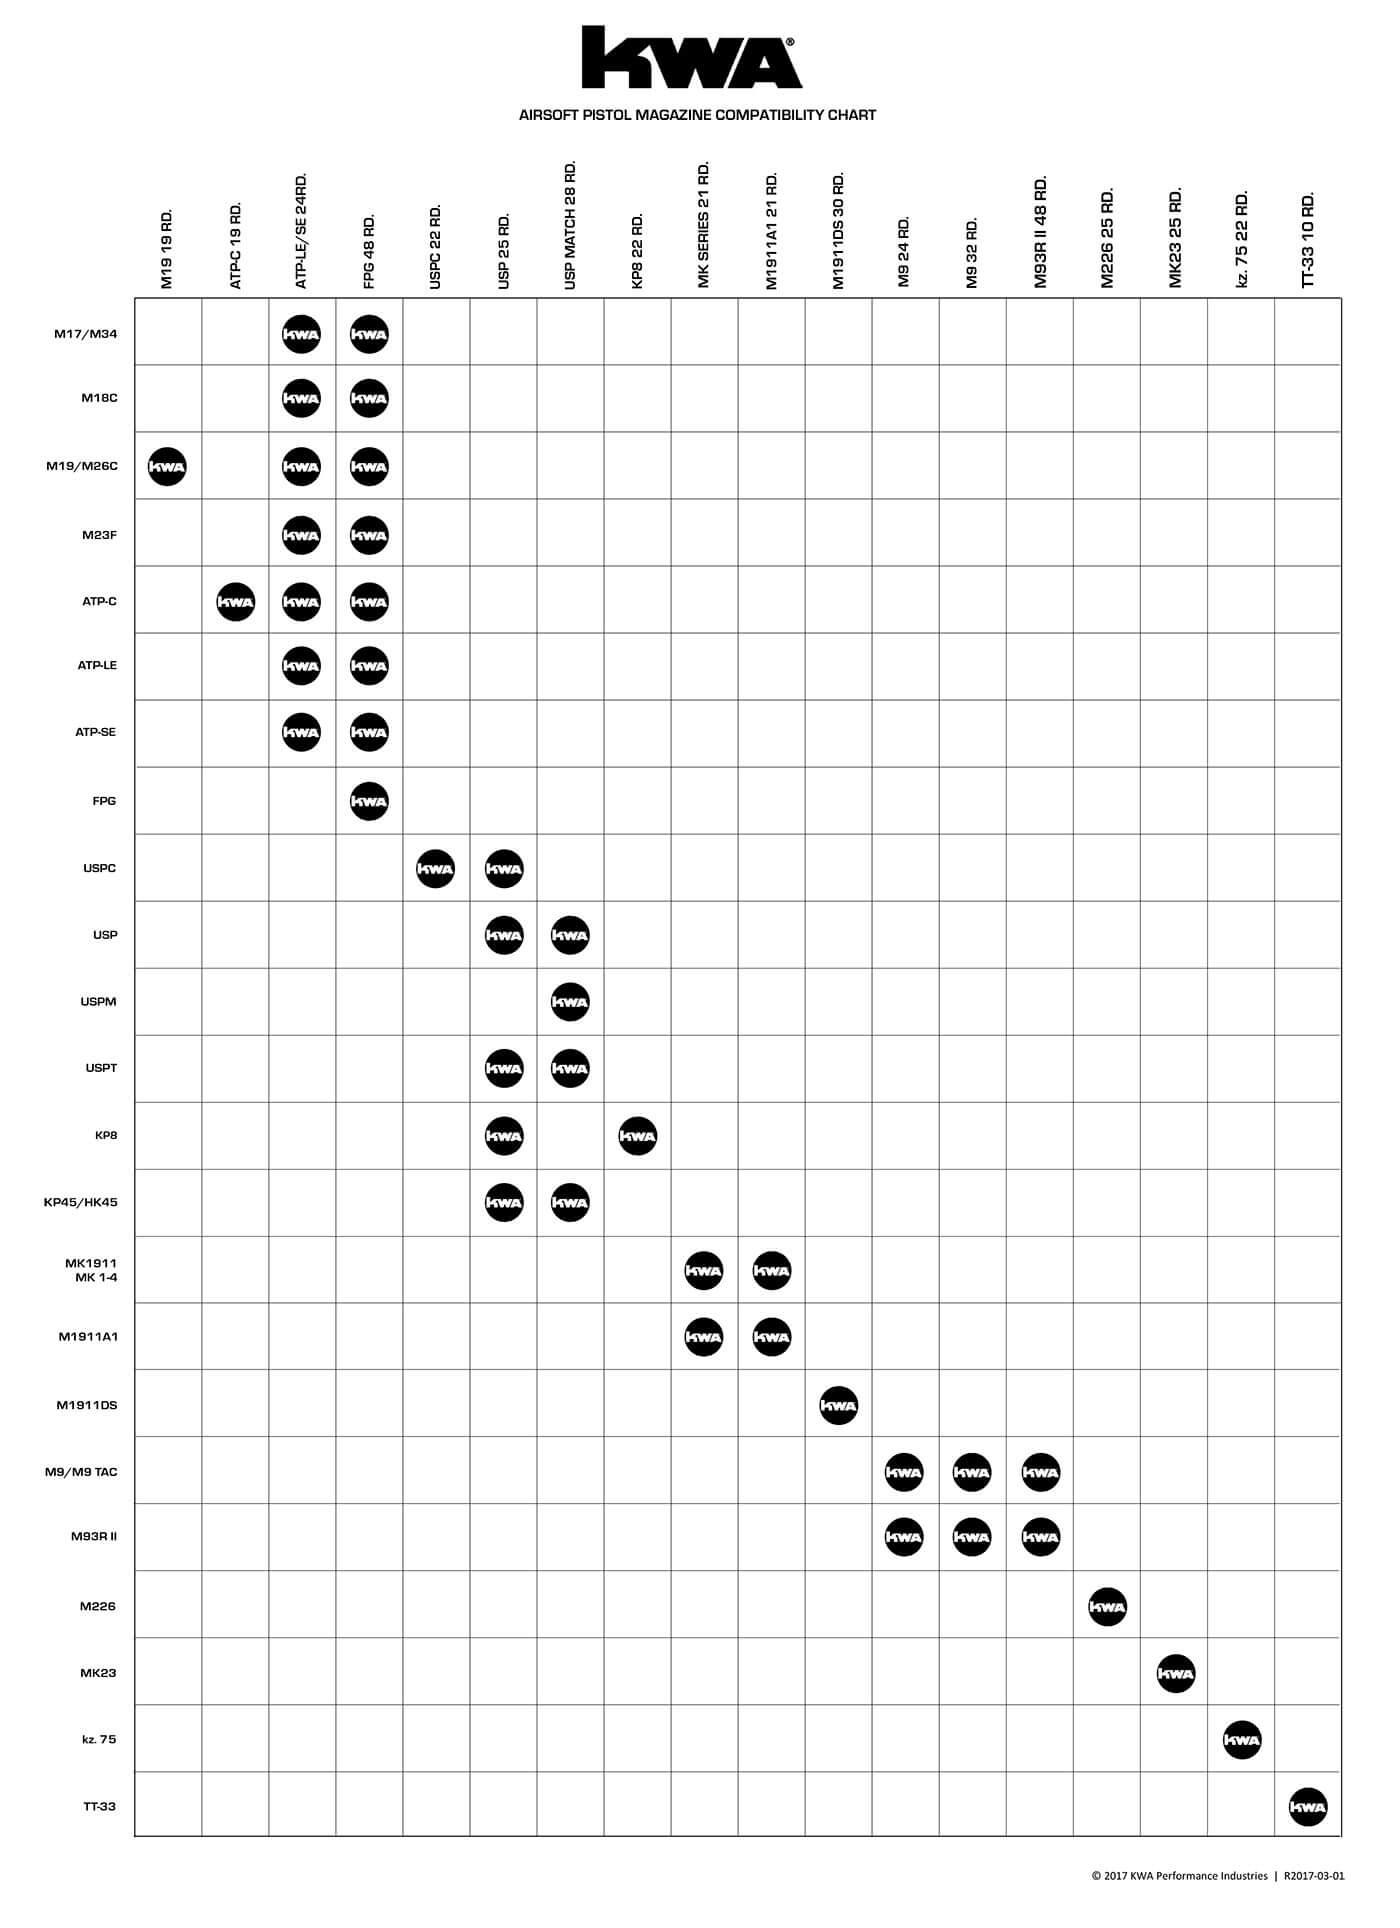 Magazine Compatibility Chart Kwa Airsoft